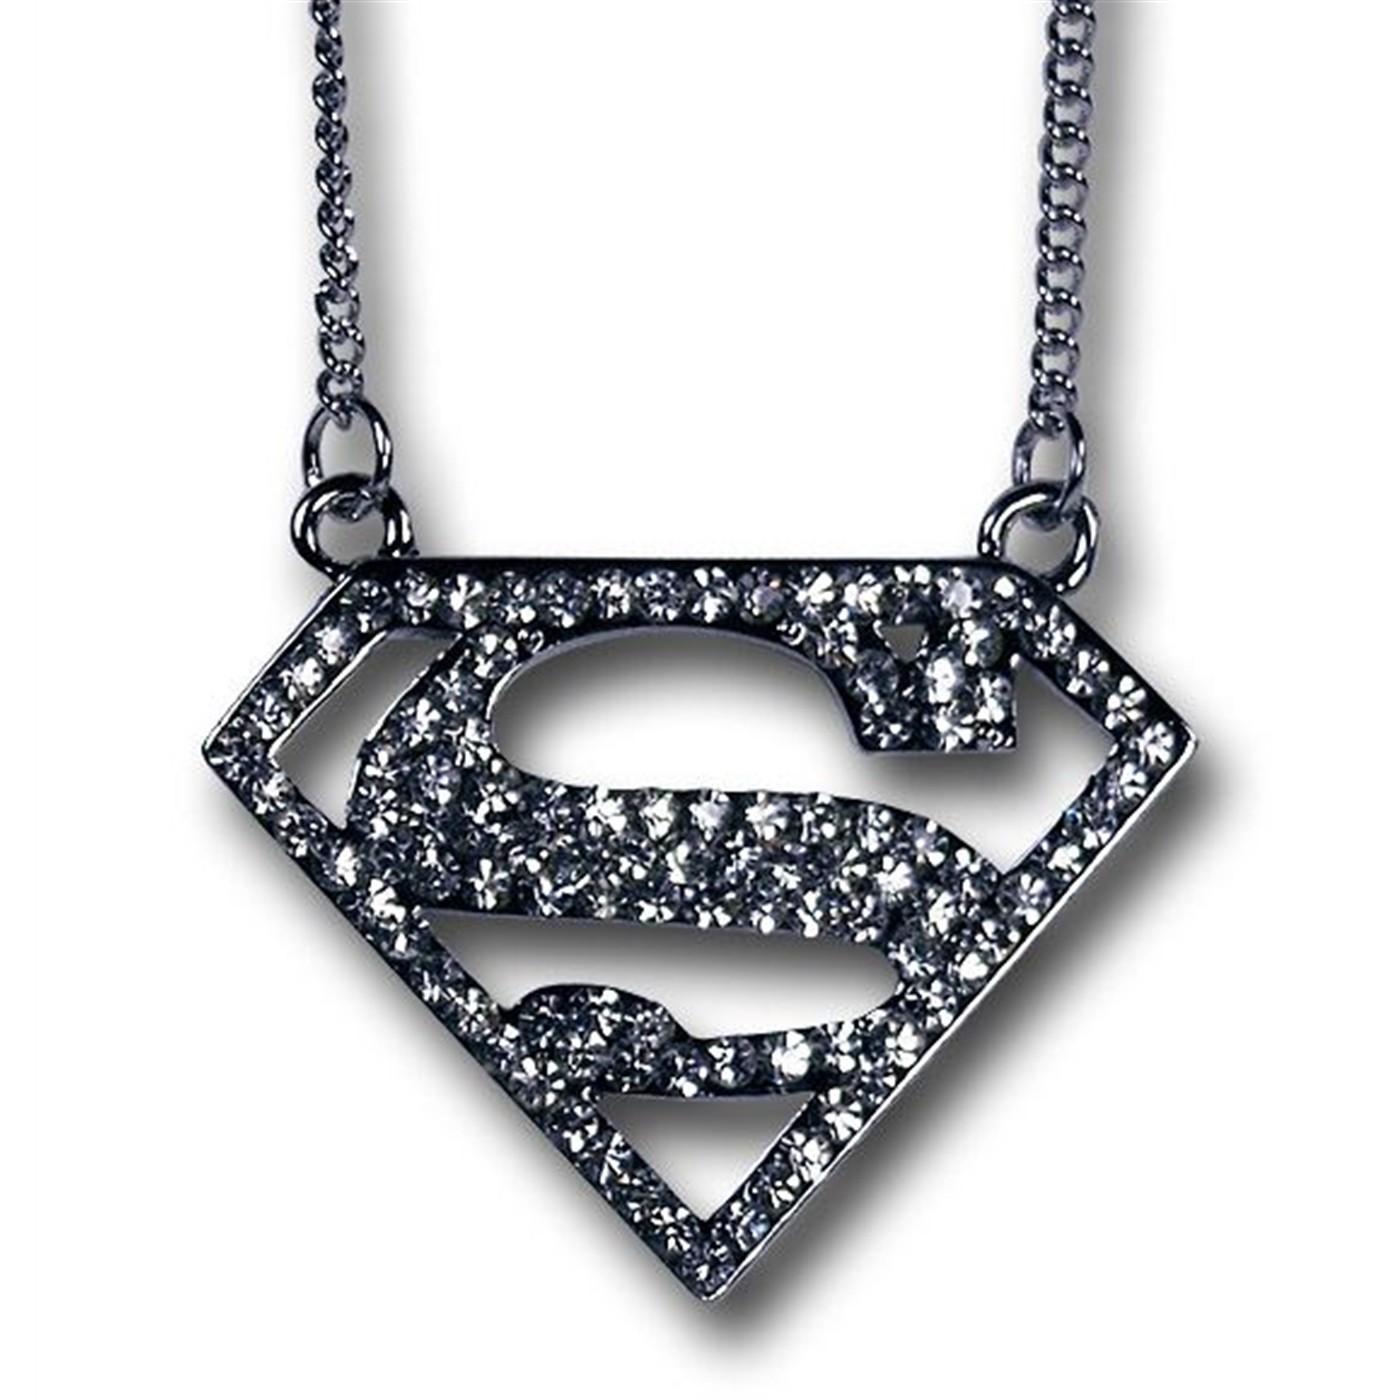 Superman Bling Symbol Necklace